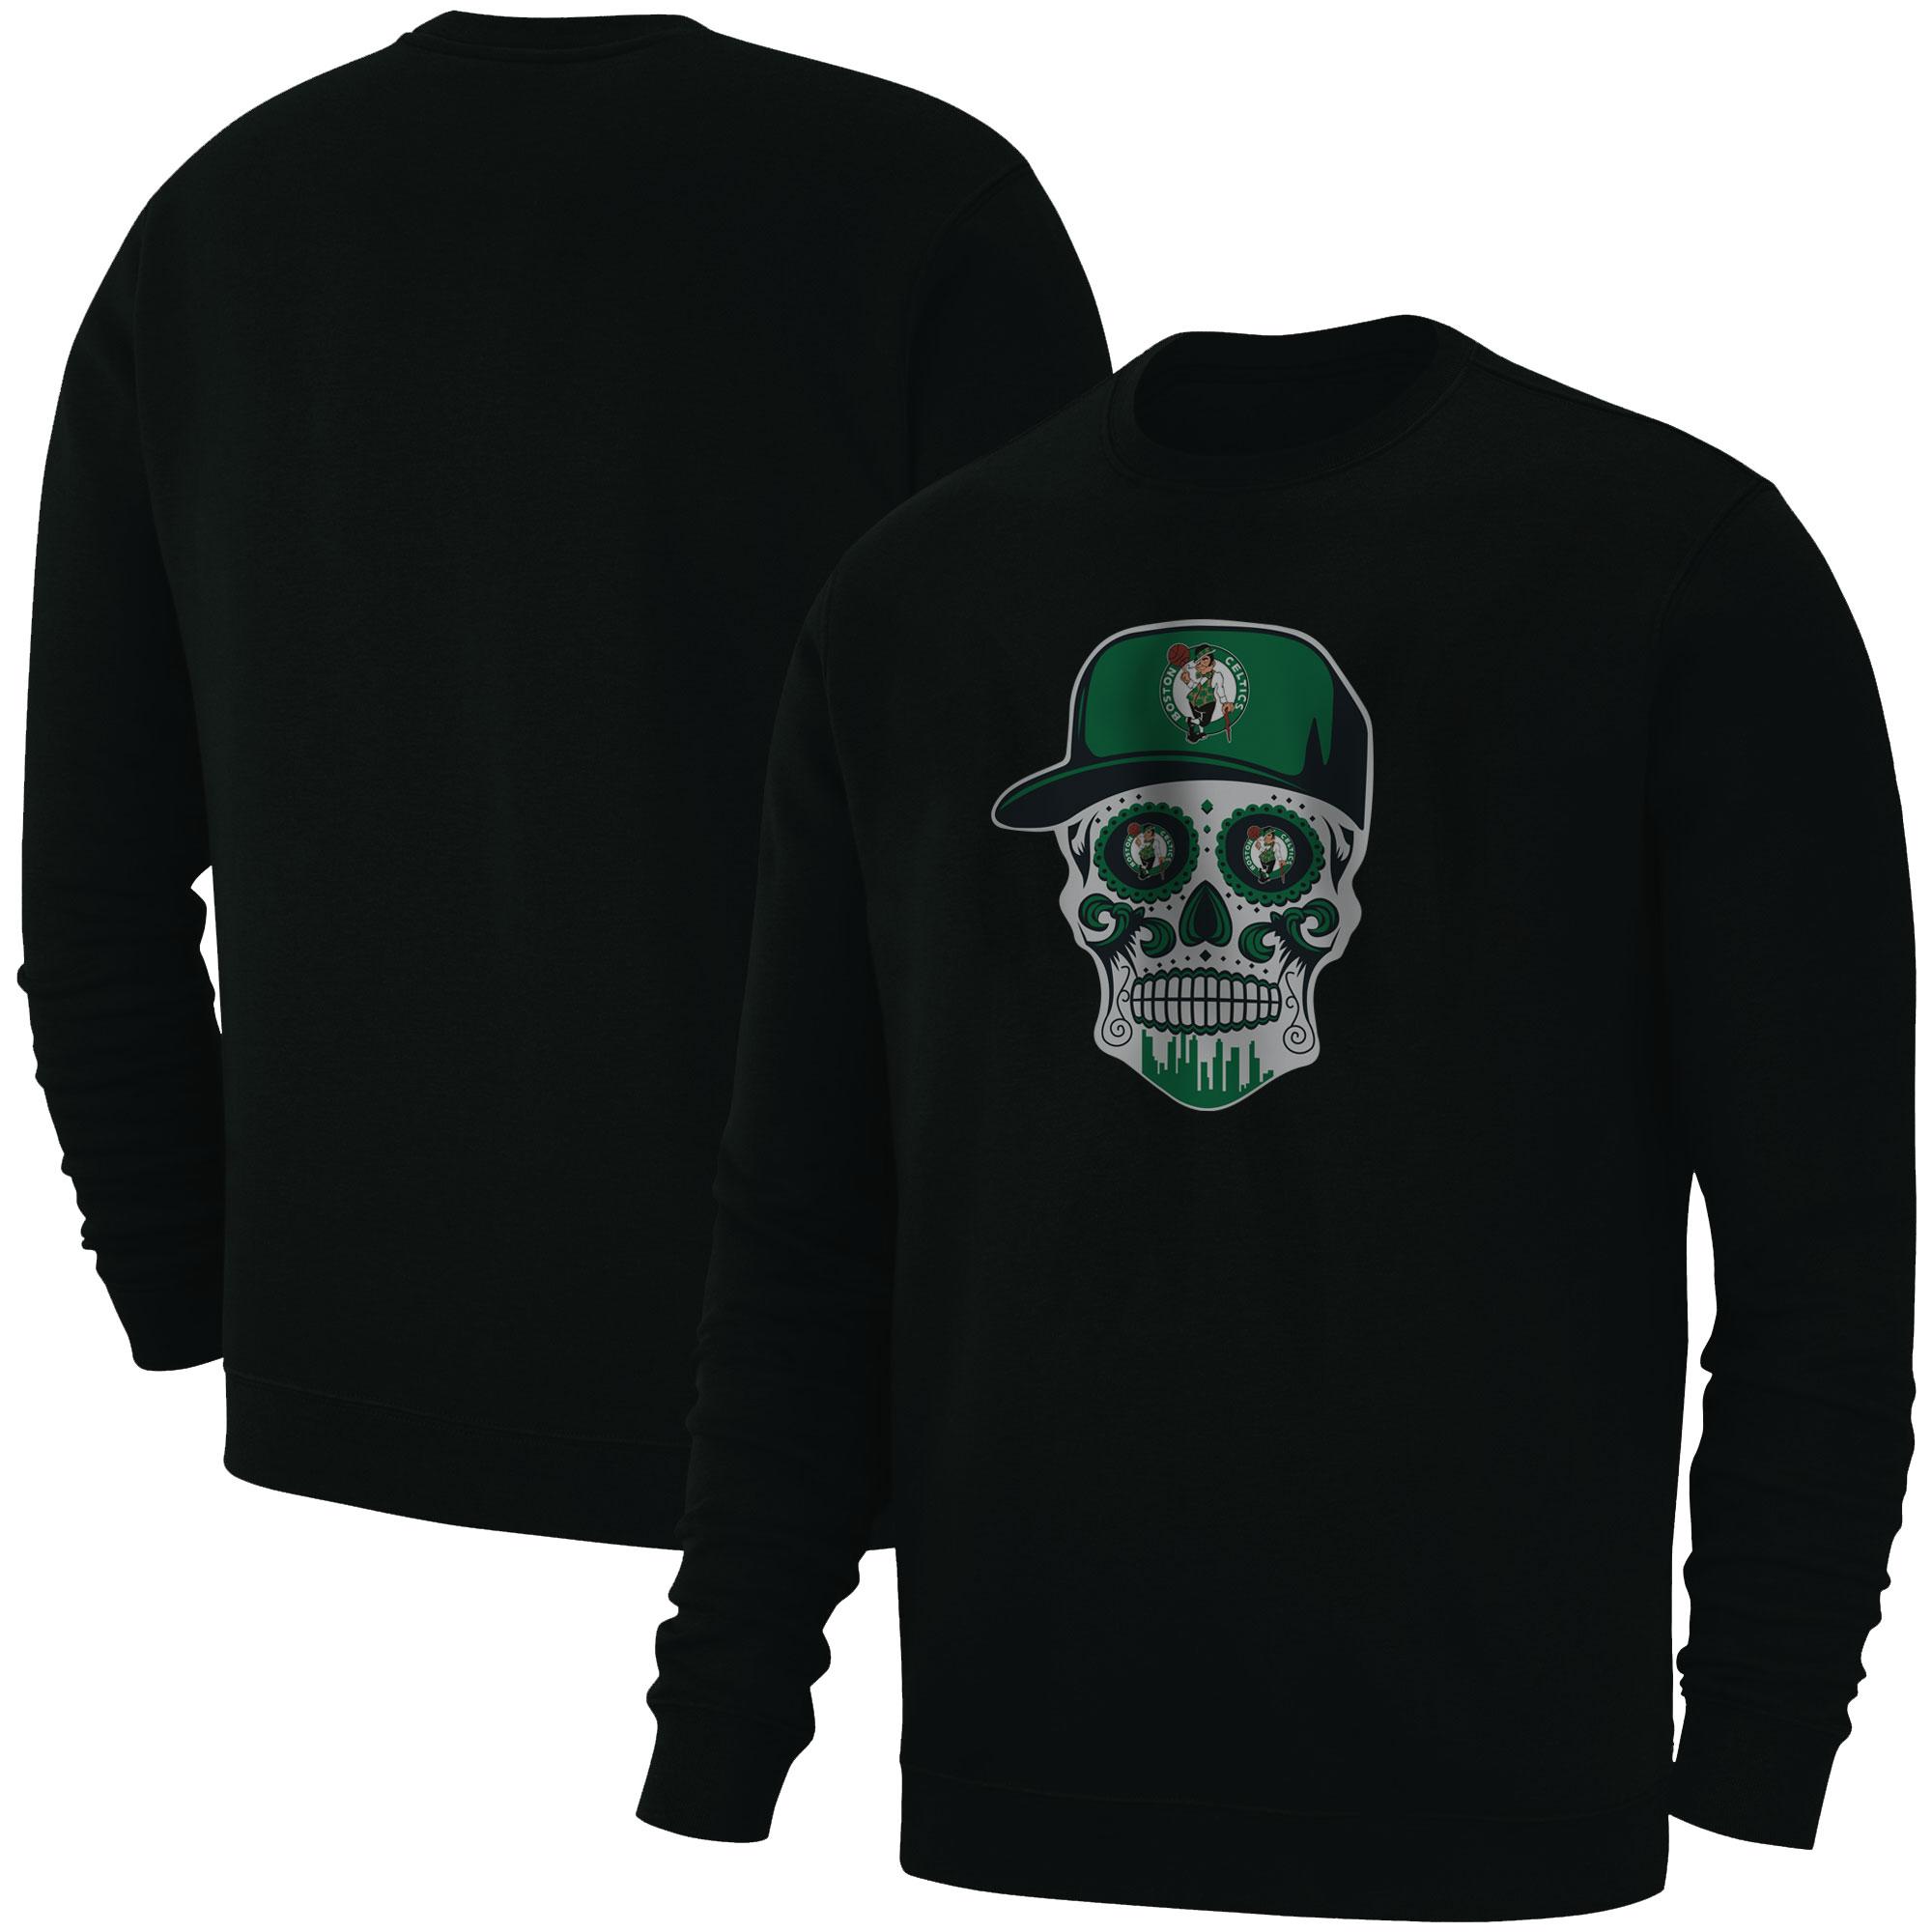 Celtics Skull  Basic (BSC-BLC-NP-448-NBA-BSTN-SKULL)